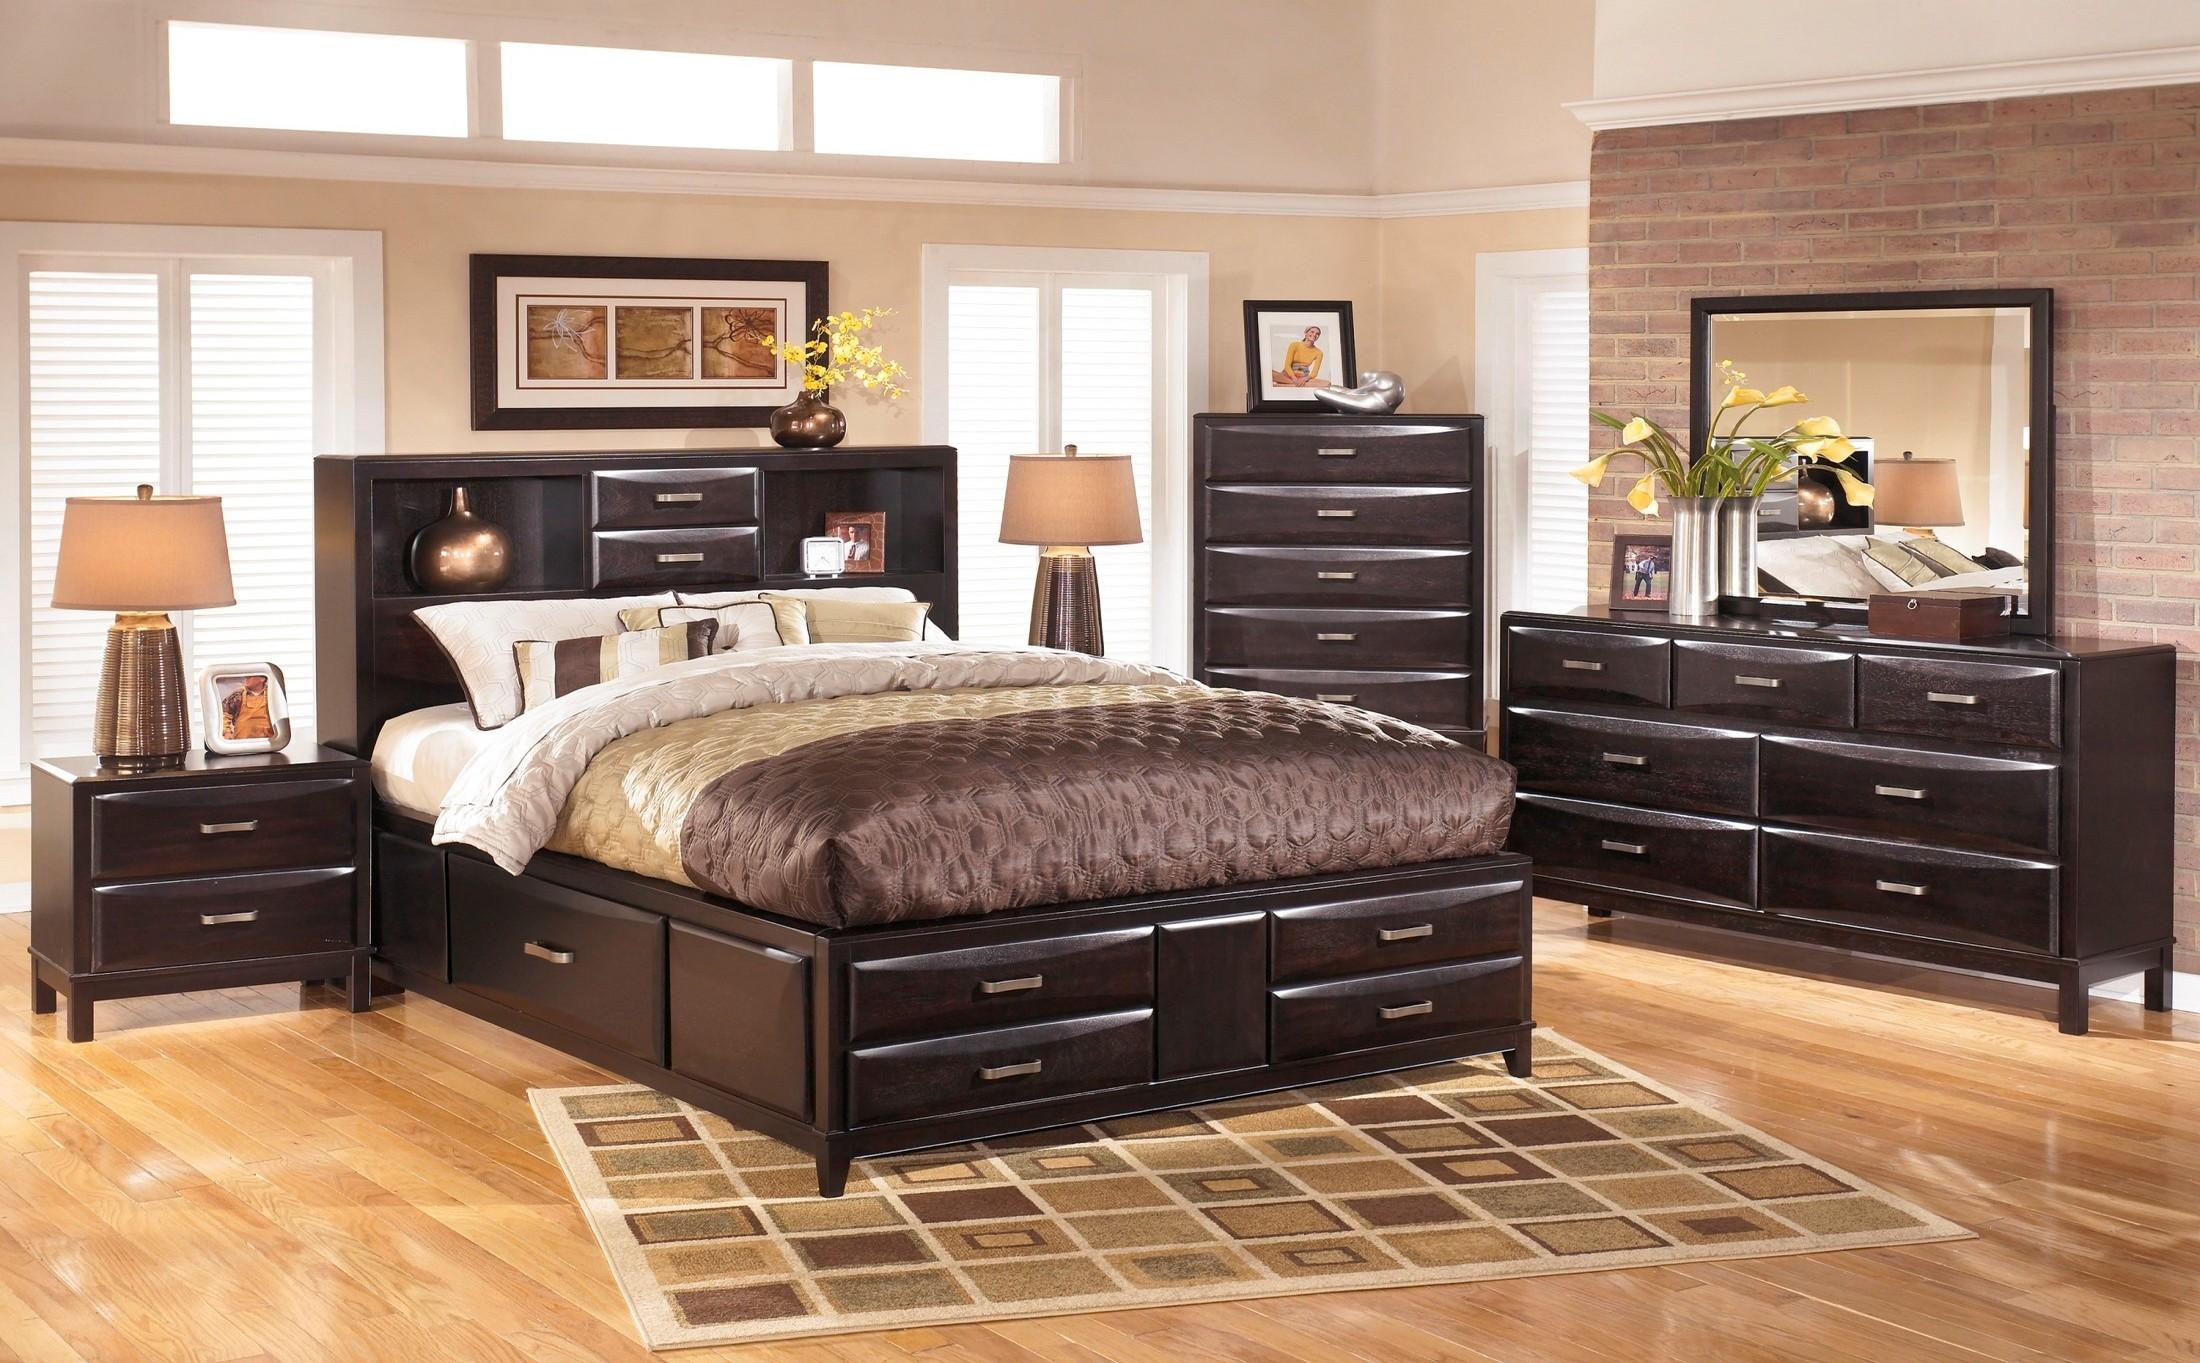 Kira Storage Bedroom Set - 1StopBedrooms.